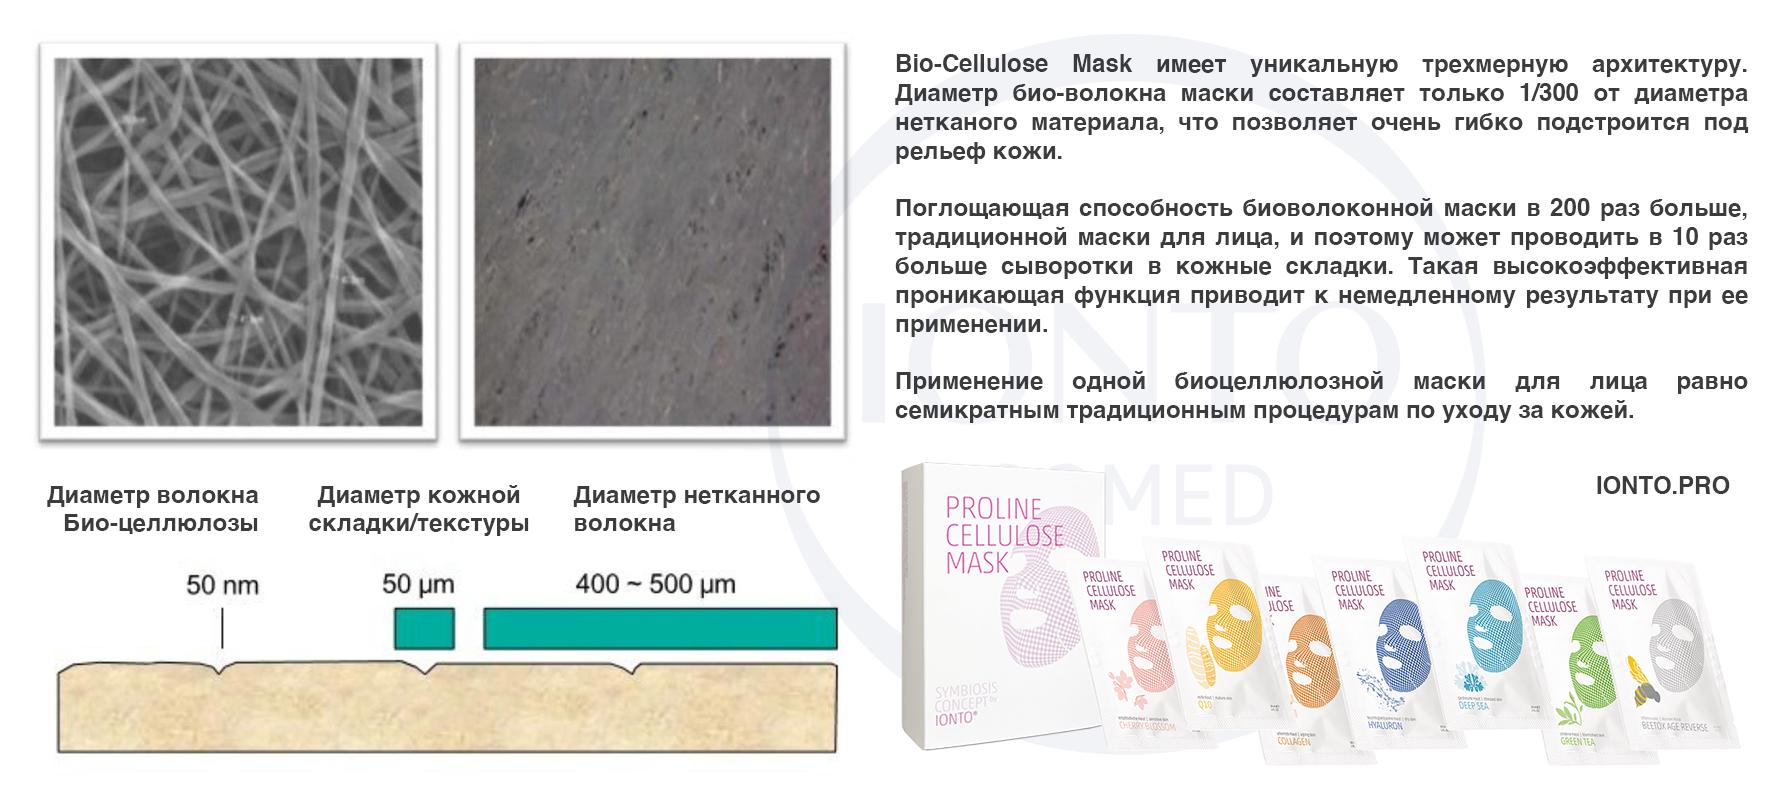 Био-целлюлозная маска HYALURON